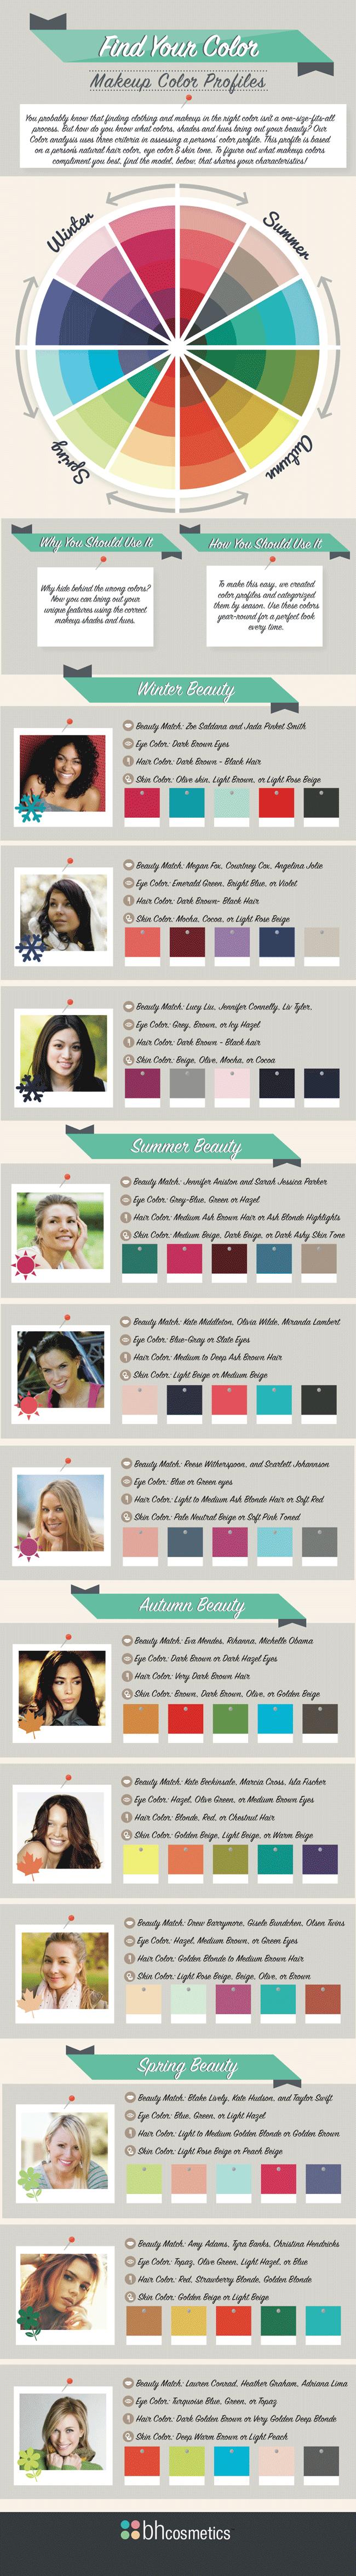 Find Your Makeup Color Profiles